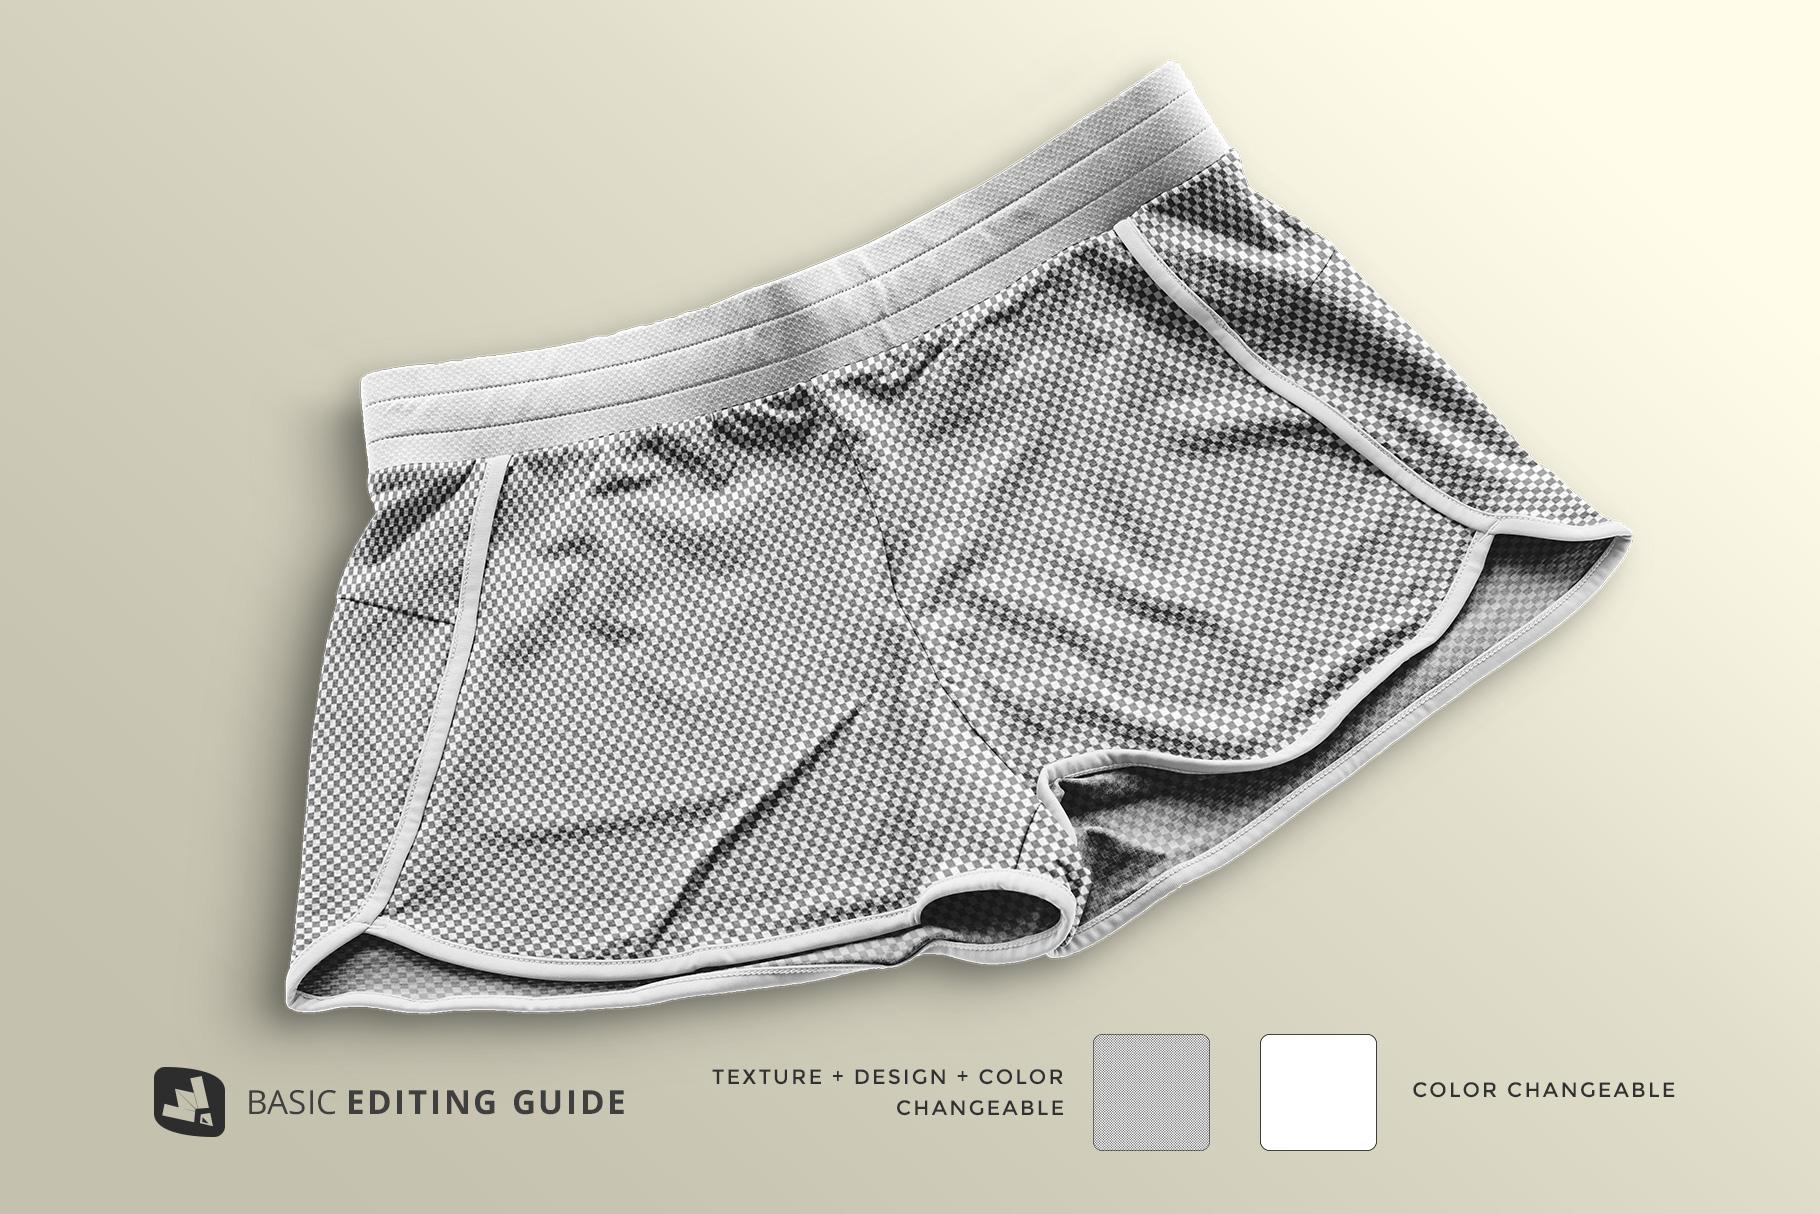 editability of the female sportswear shorts mockup